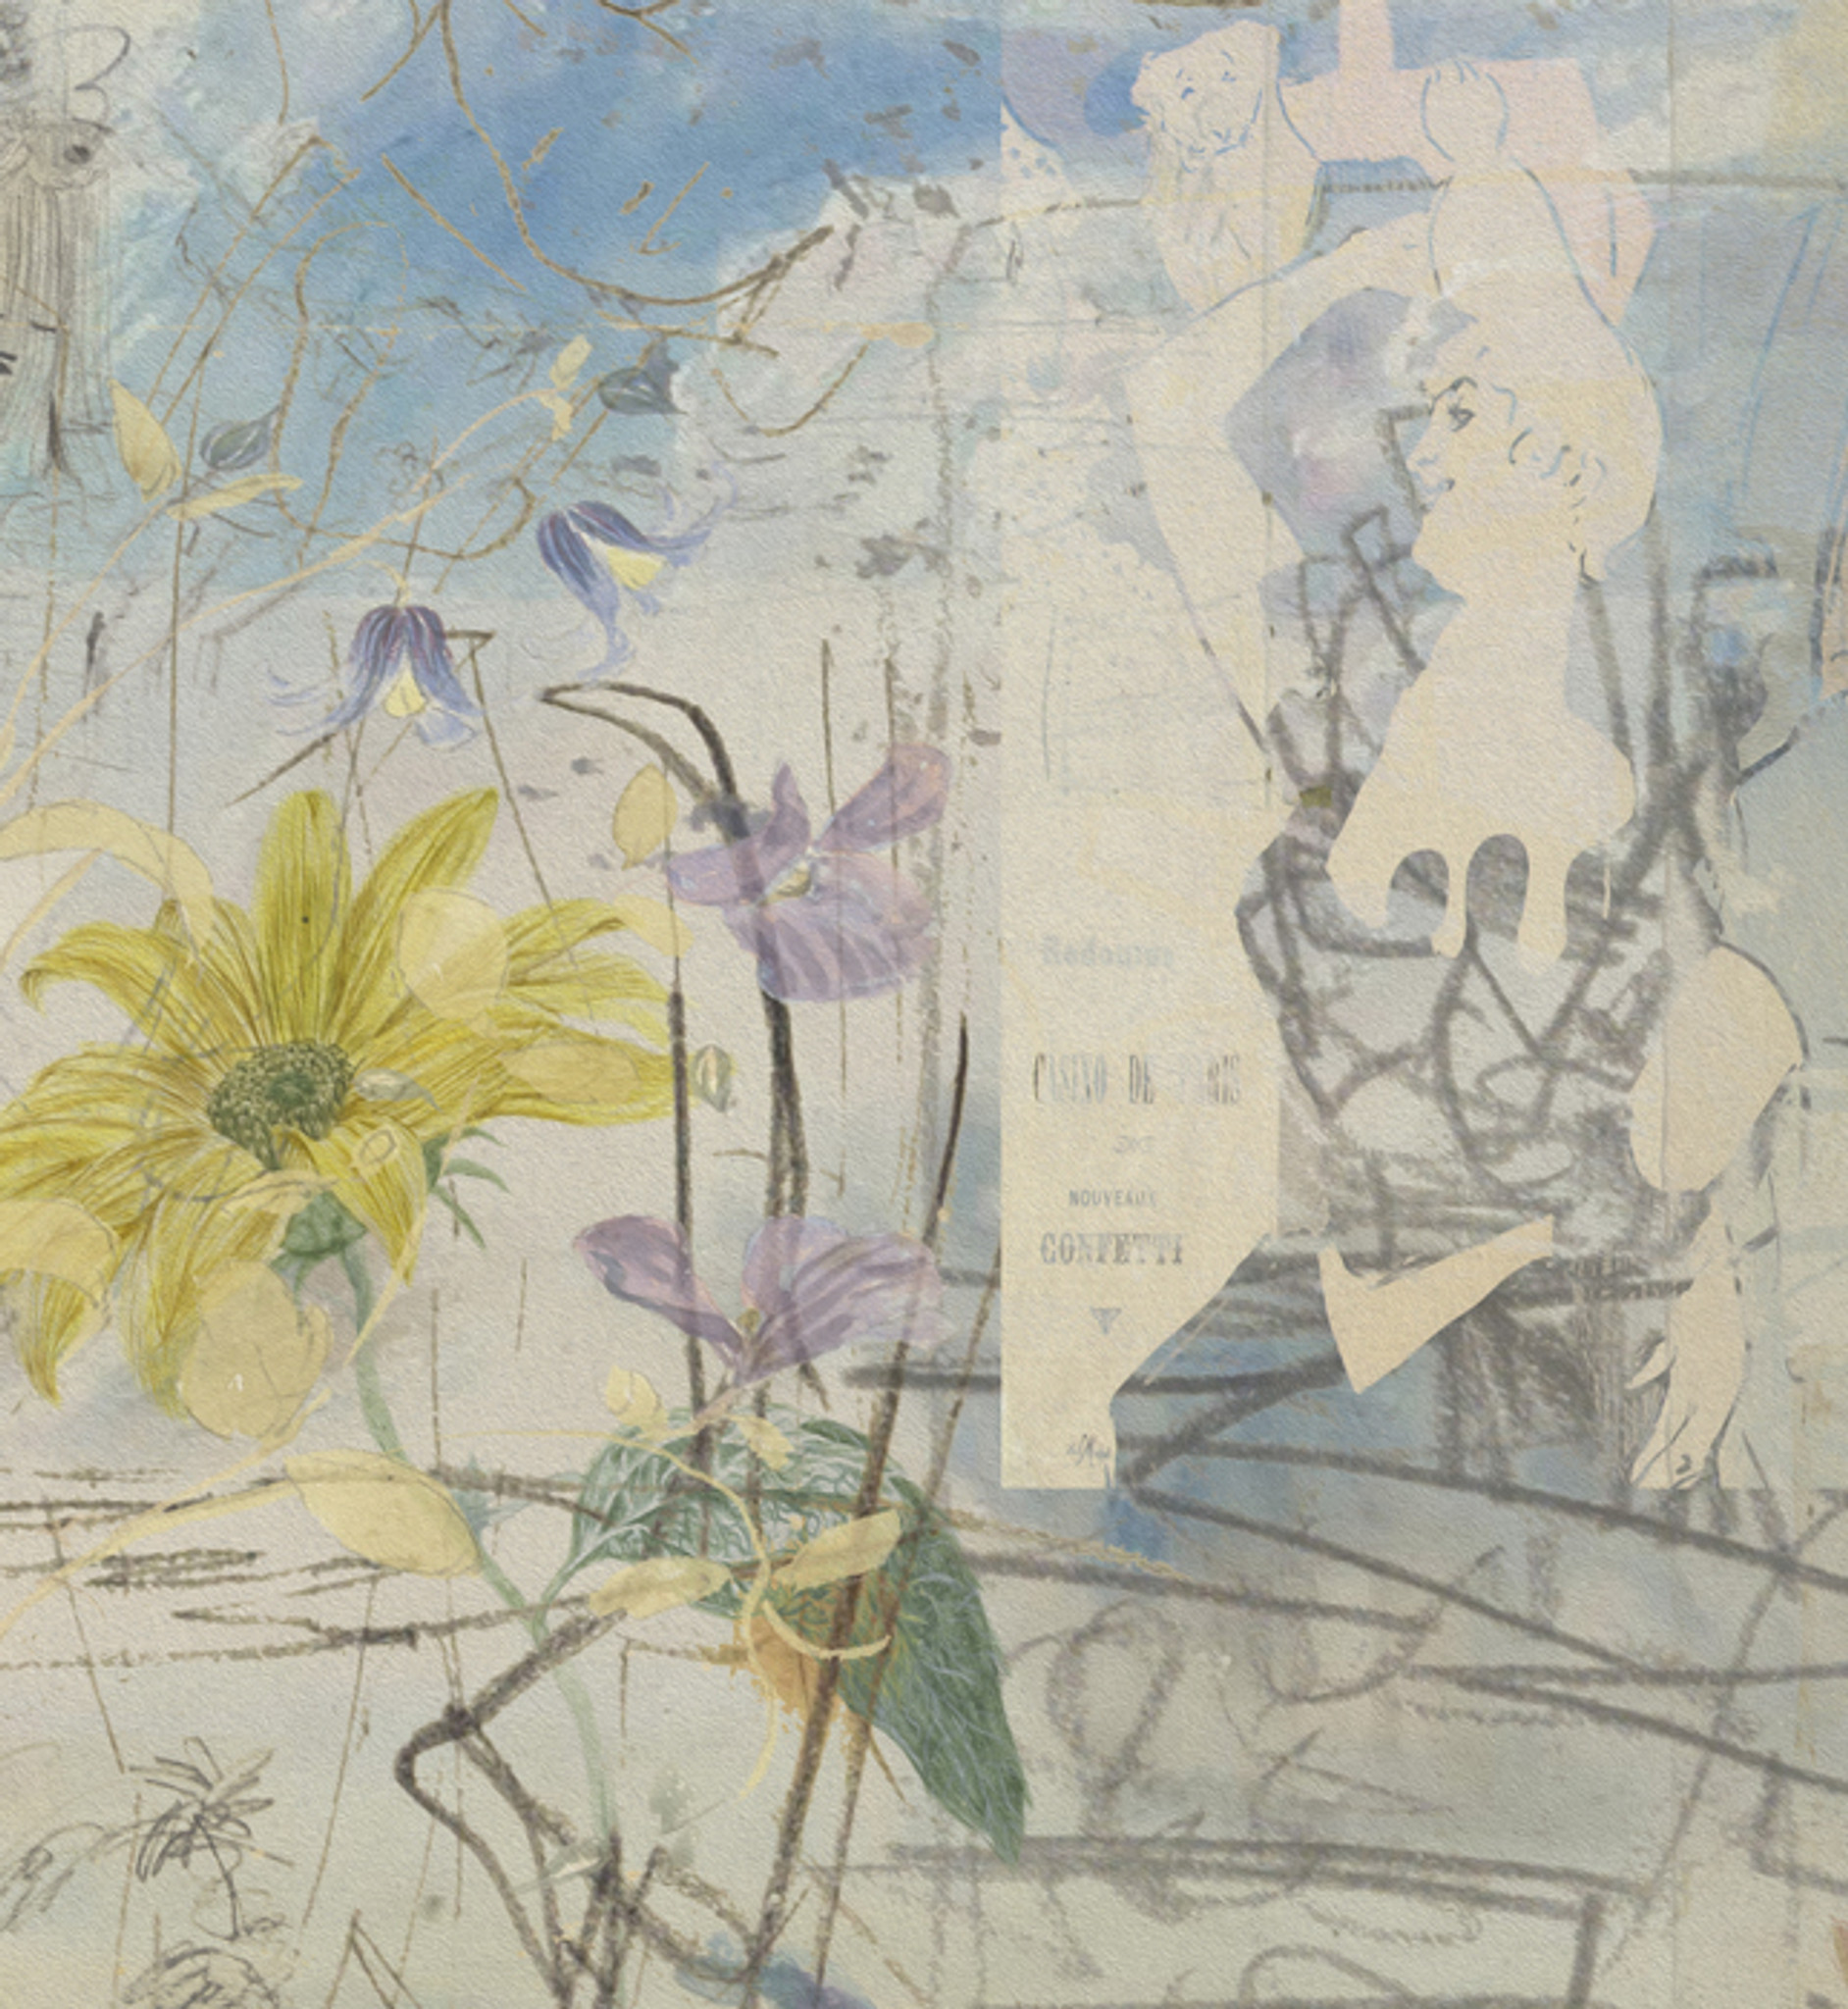 Wallpaper - Urban Sketches - Moulin Girls